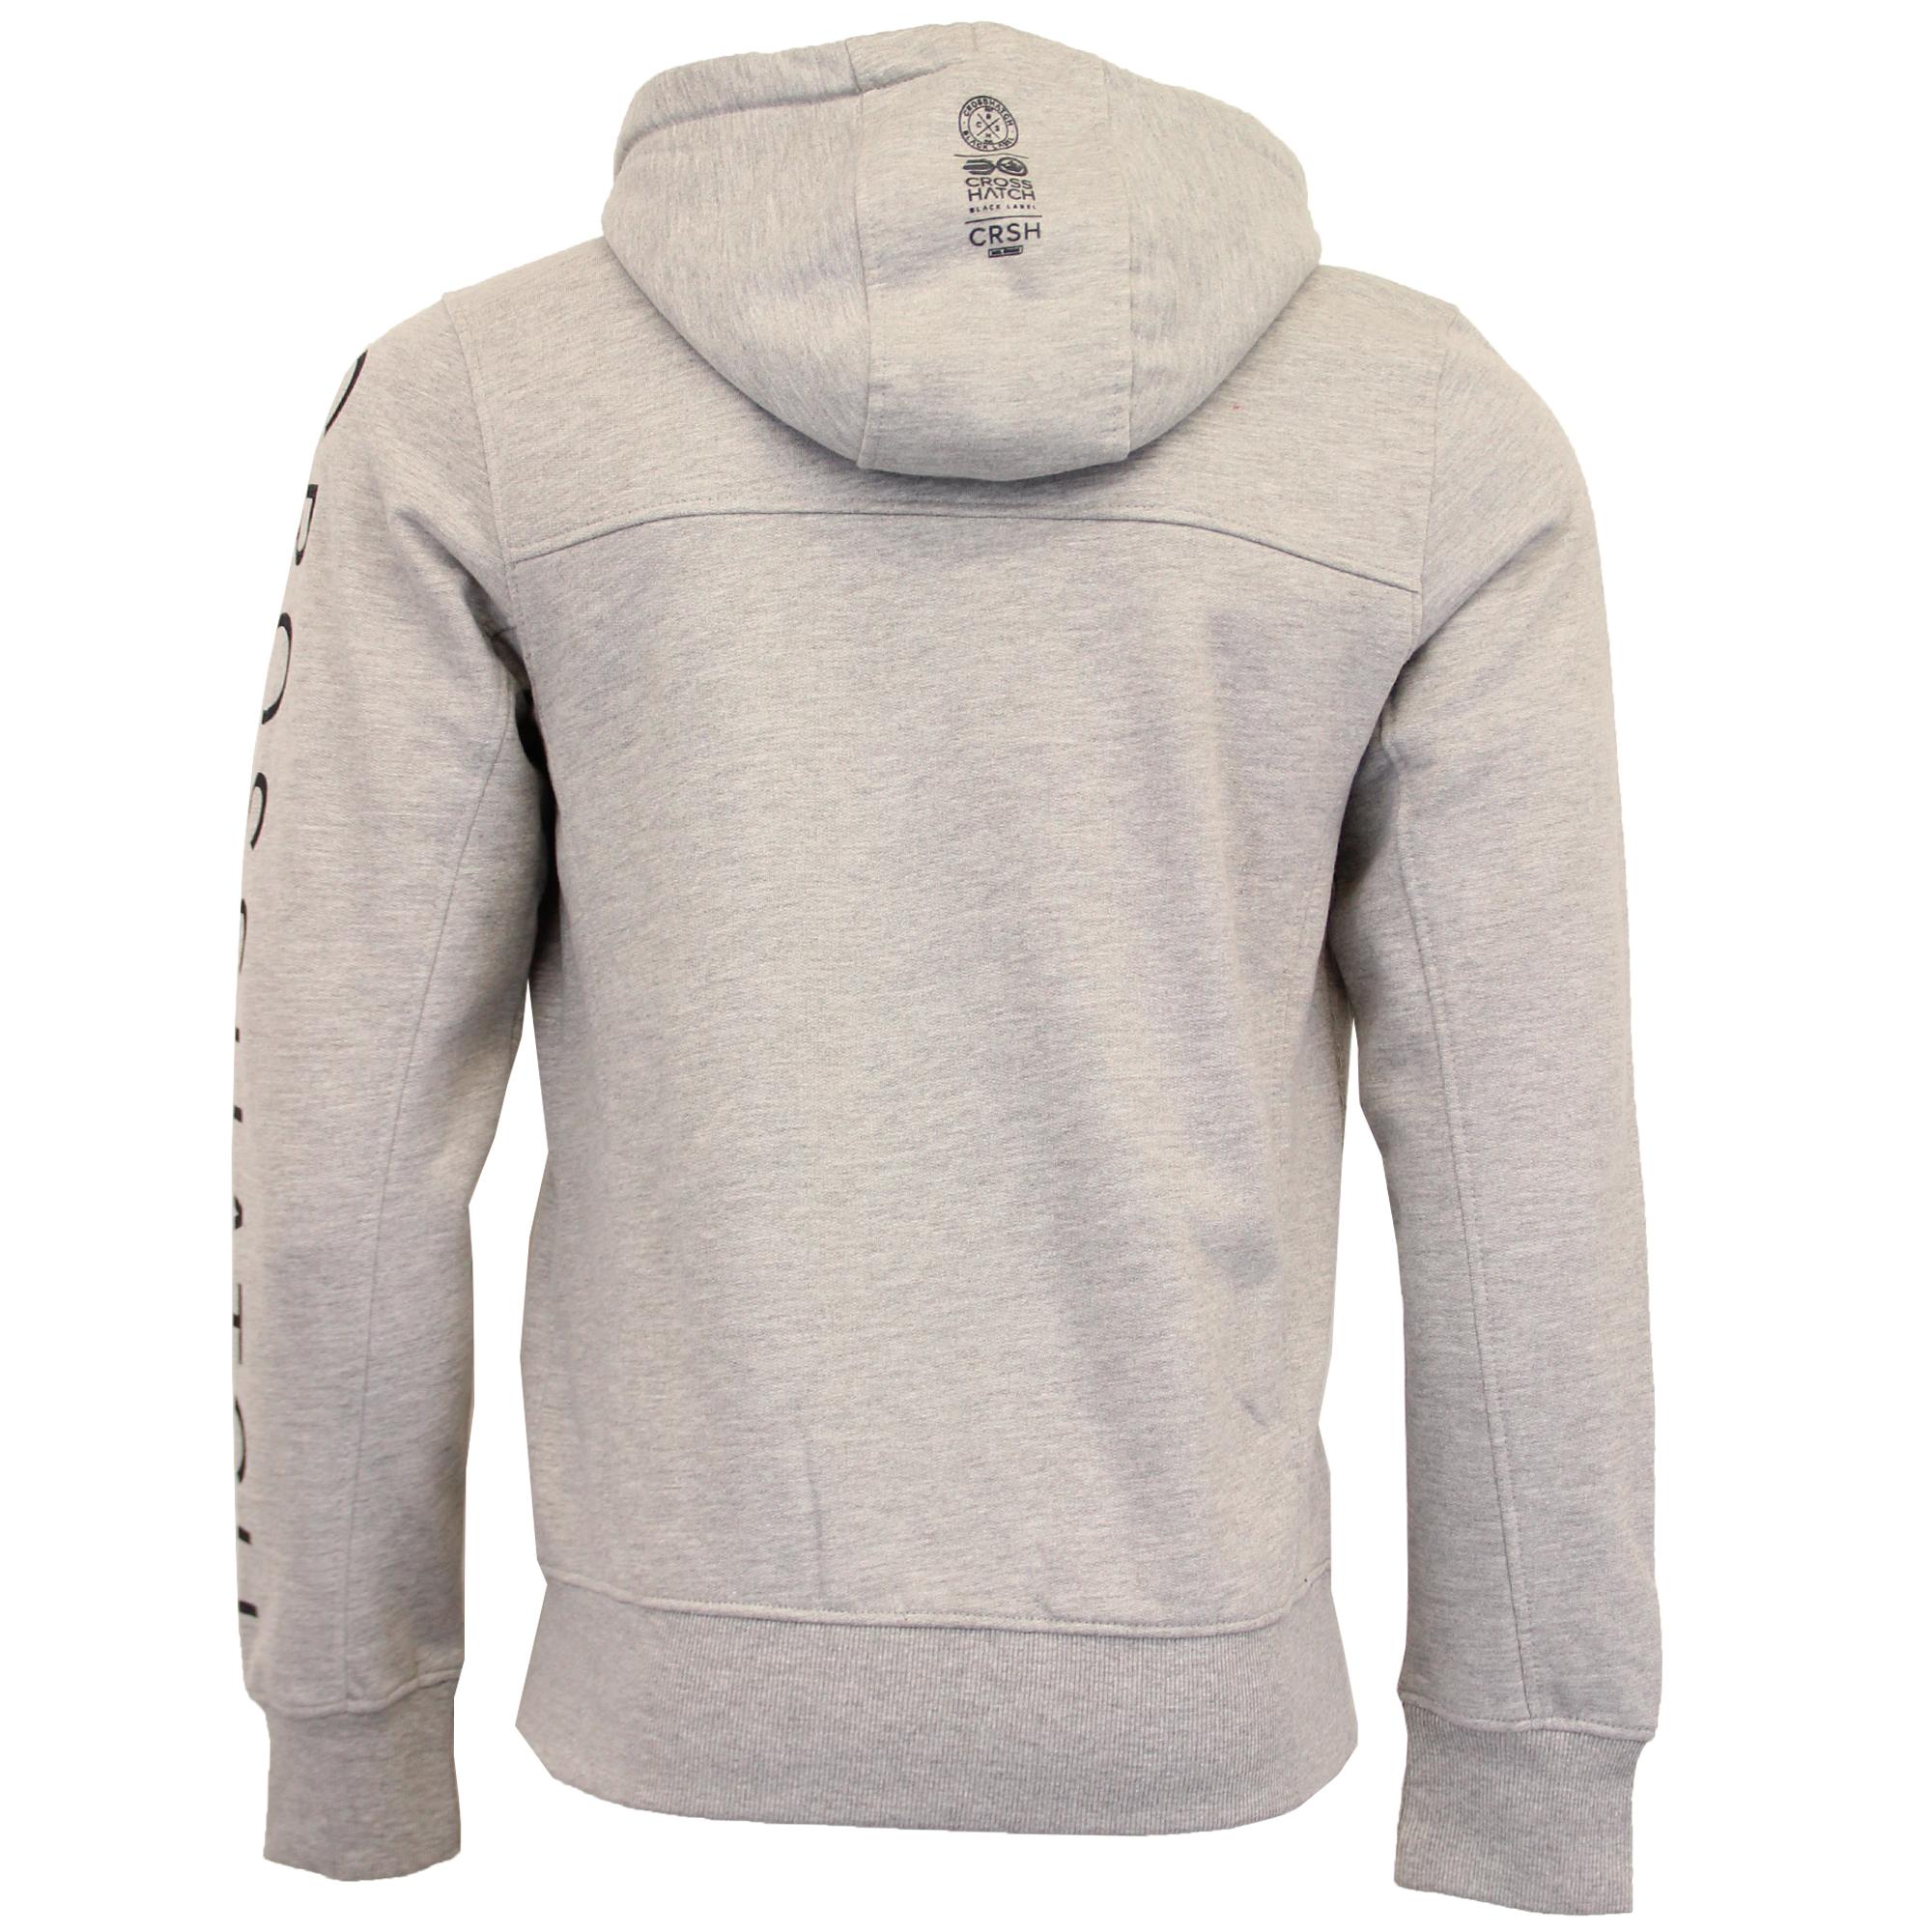 Mens-Sweatshirt-Crosshatch-Hoodie-Top-Embossed-Logo-Print-Sweat-Fleece-Lined-New thumbnail 13